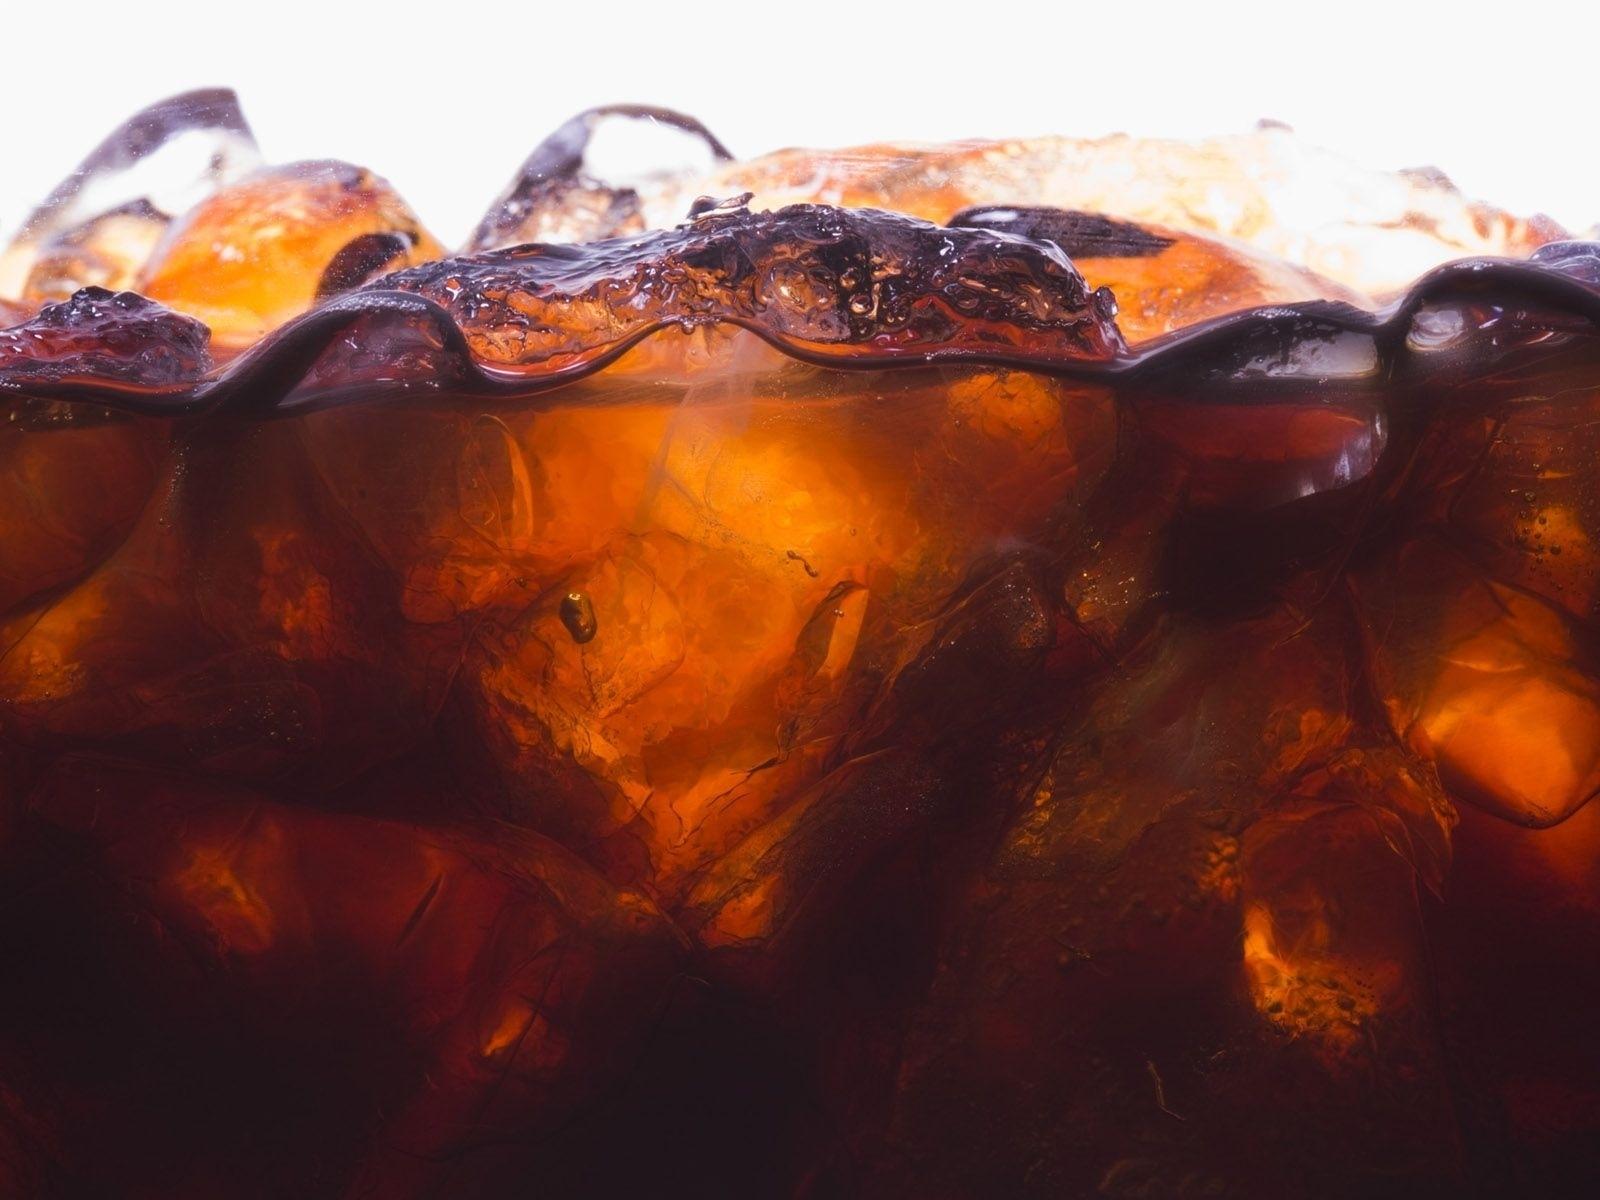 822 скачать обои Фон, Лед, Кока-Кола (Coca-Cola) - заставки и картинки бесплатно